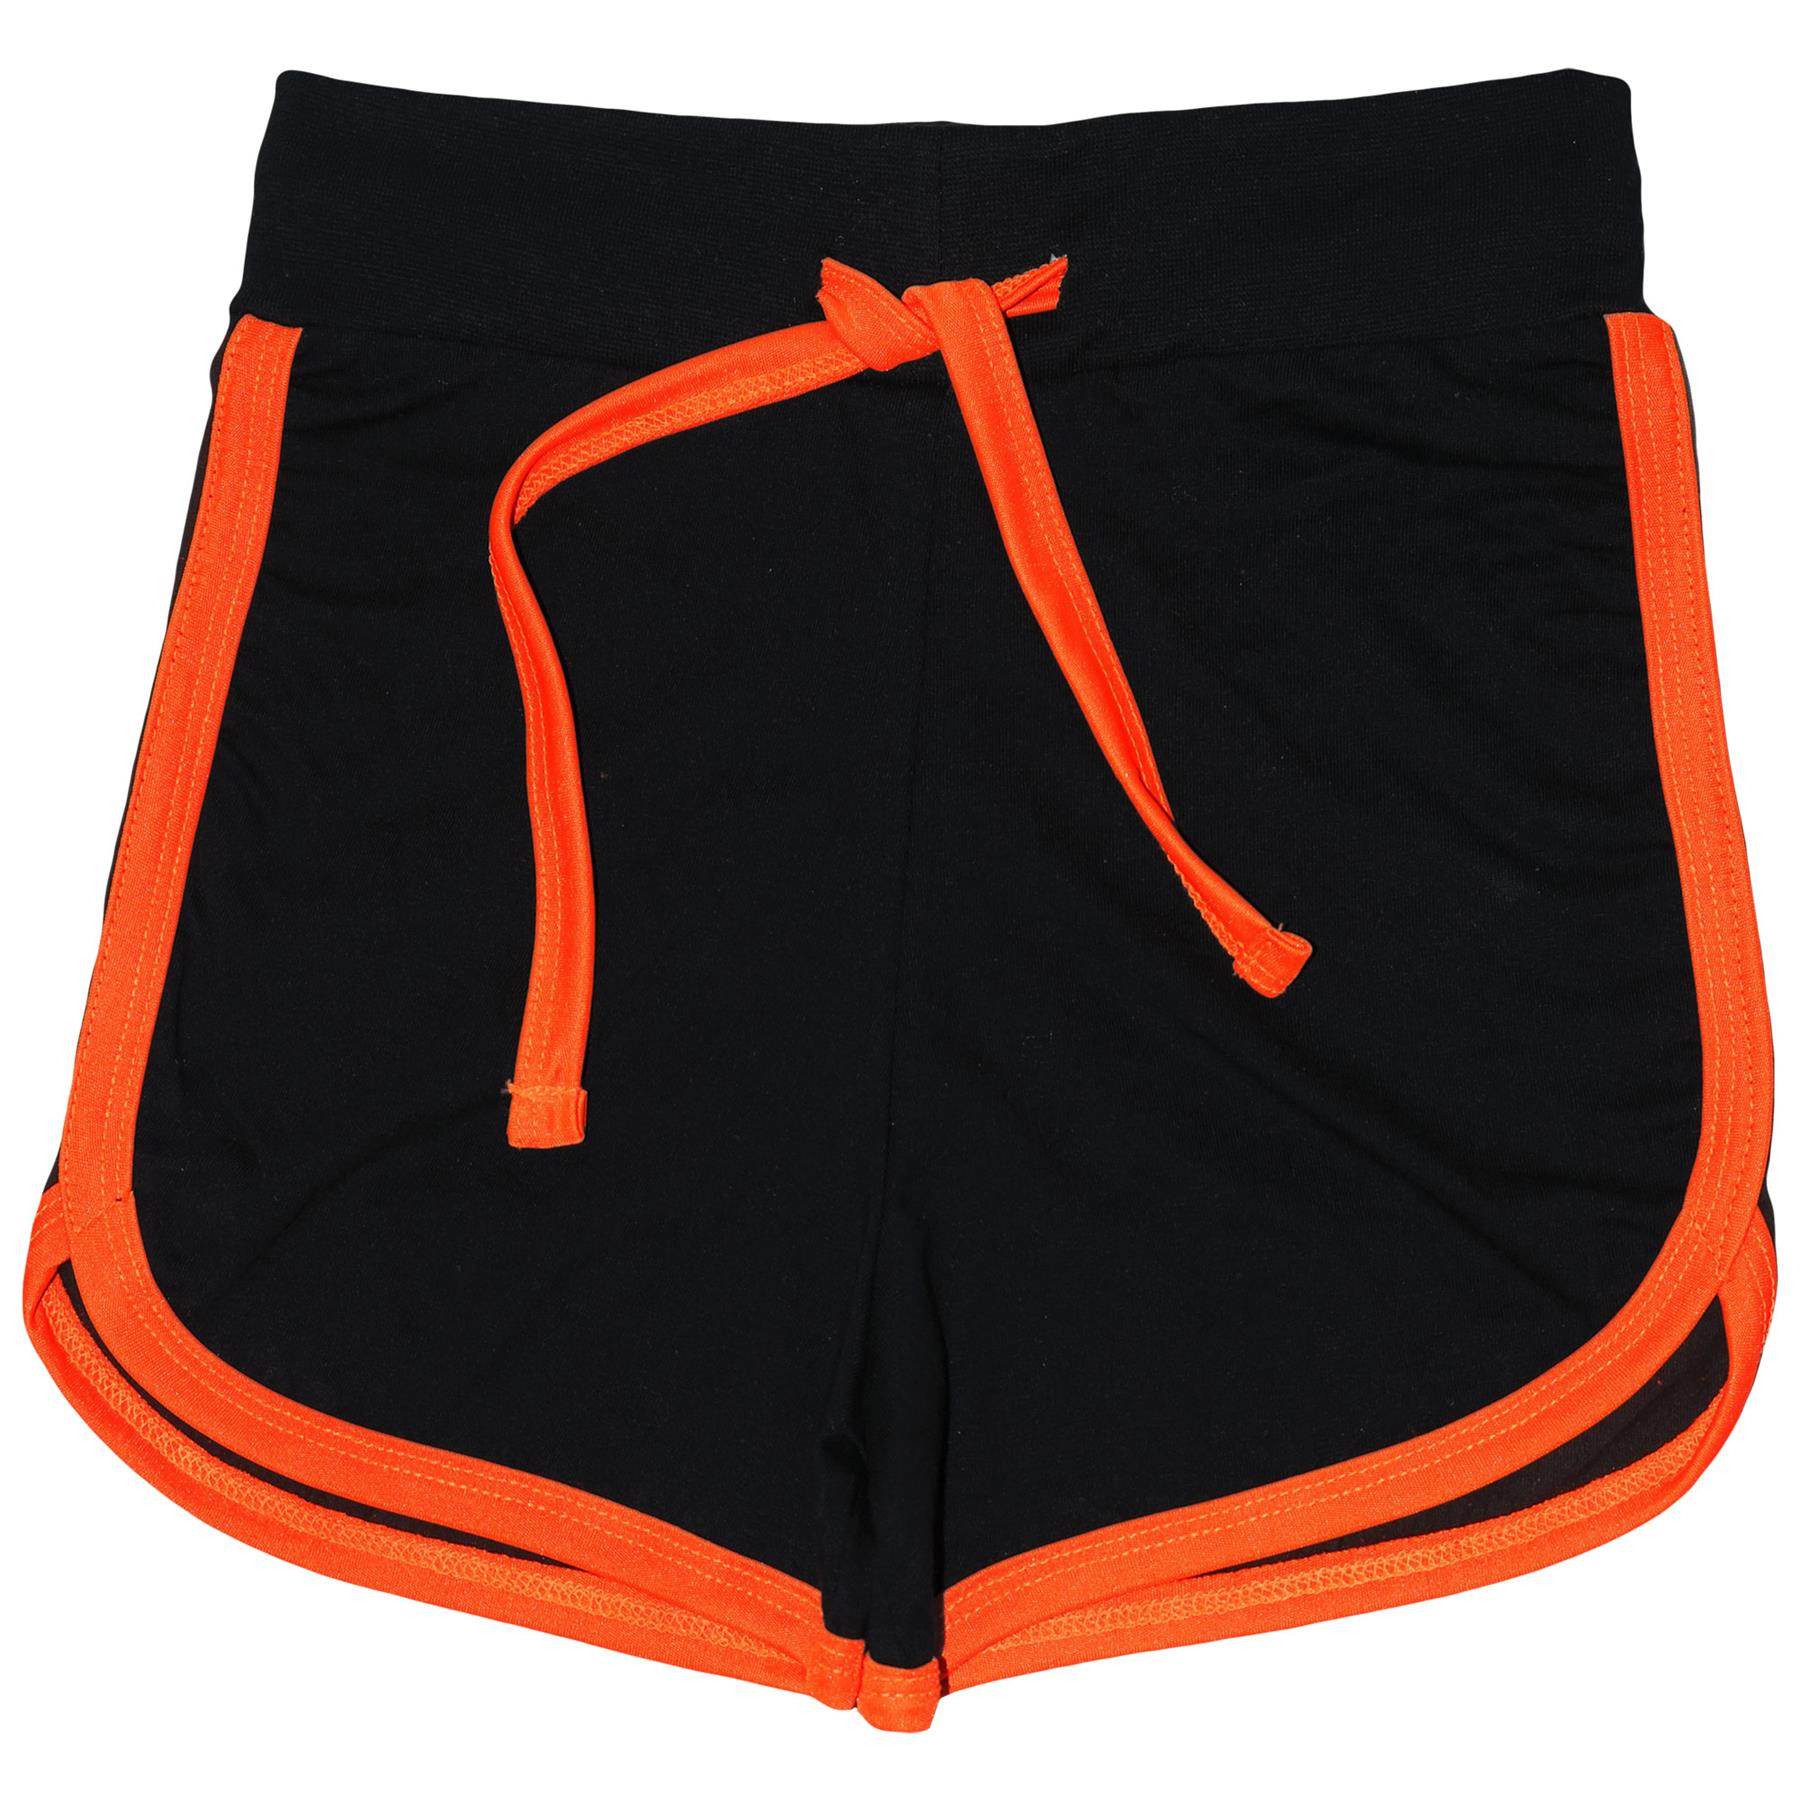 Kids-Girls-Shorts-100-Cotton-Dance-Gym-Sports-Summer-Hot-Short-Pants-2-13-Years Indexbild 9